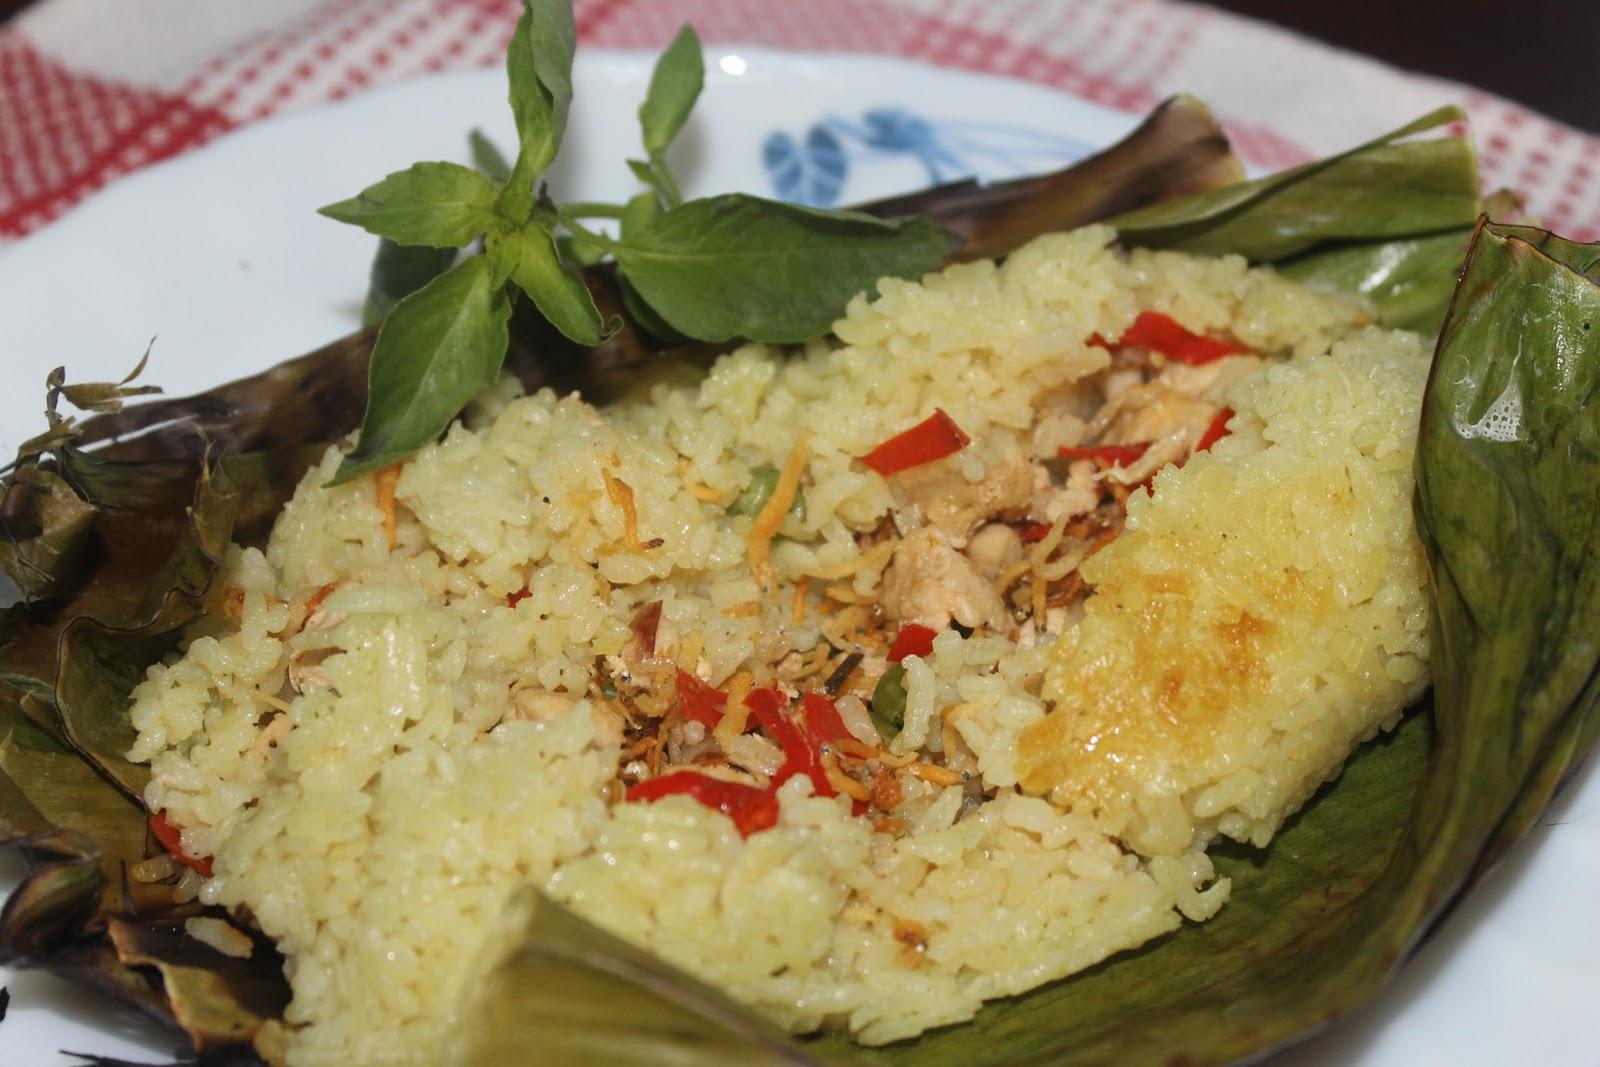 Resep Nasi Bakar Teri - Koleksi Menu Masakan Sedap